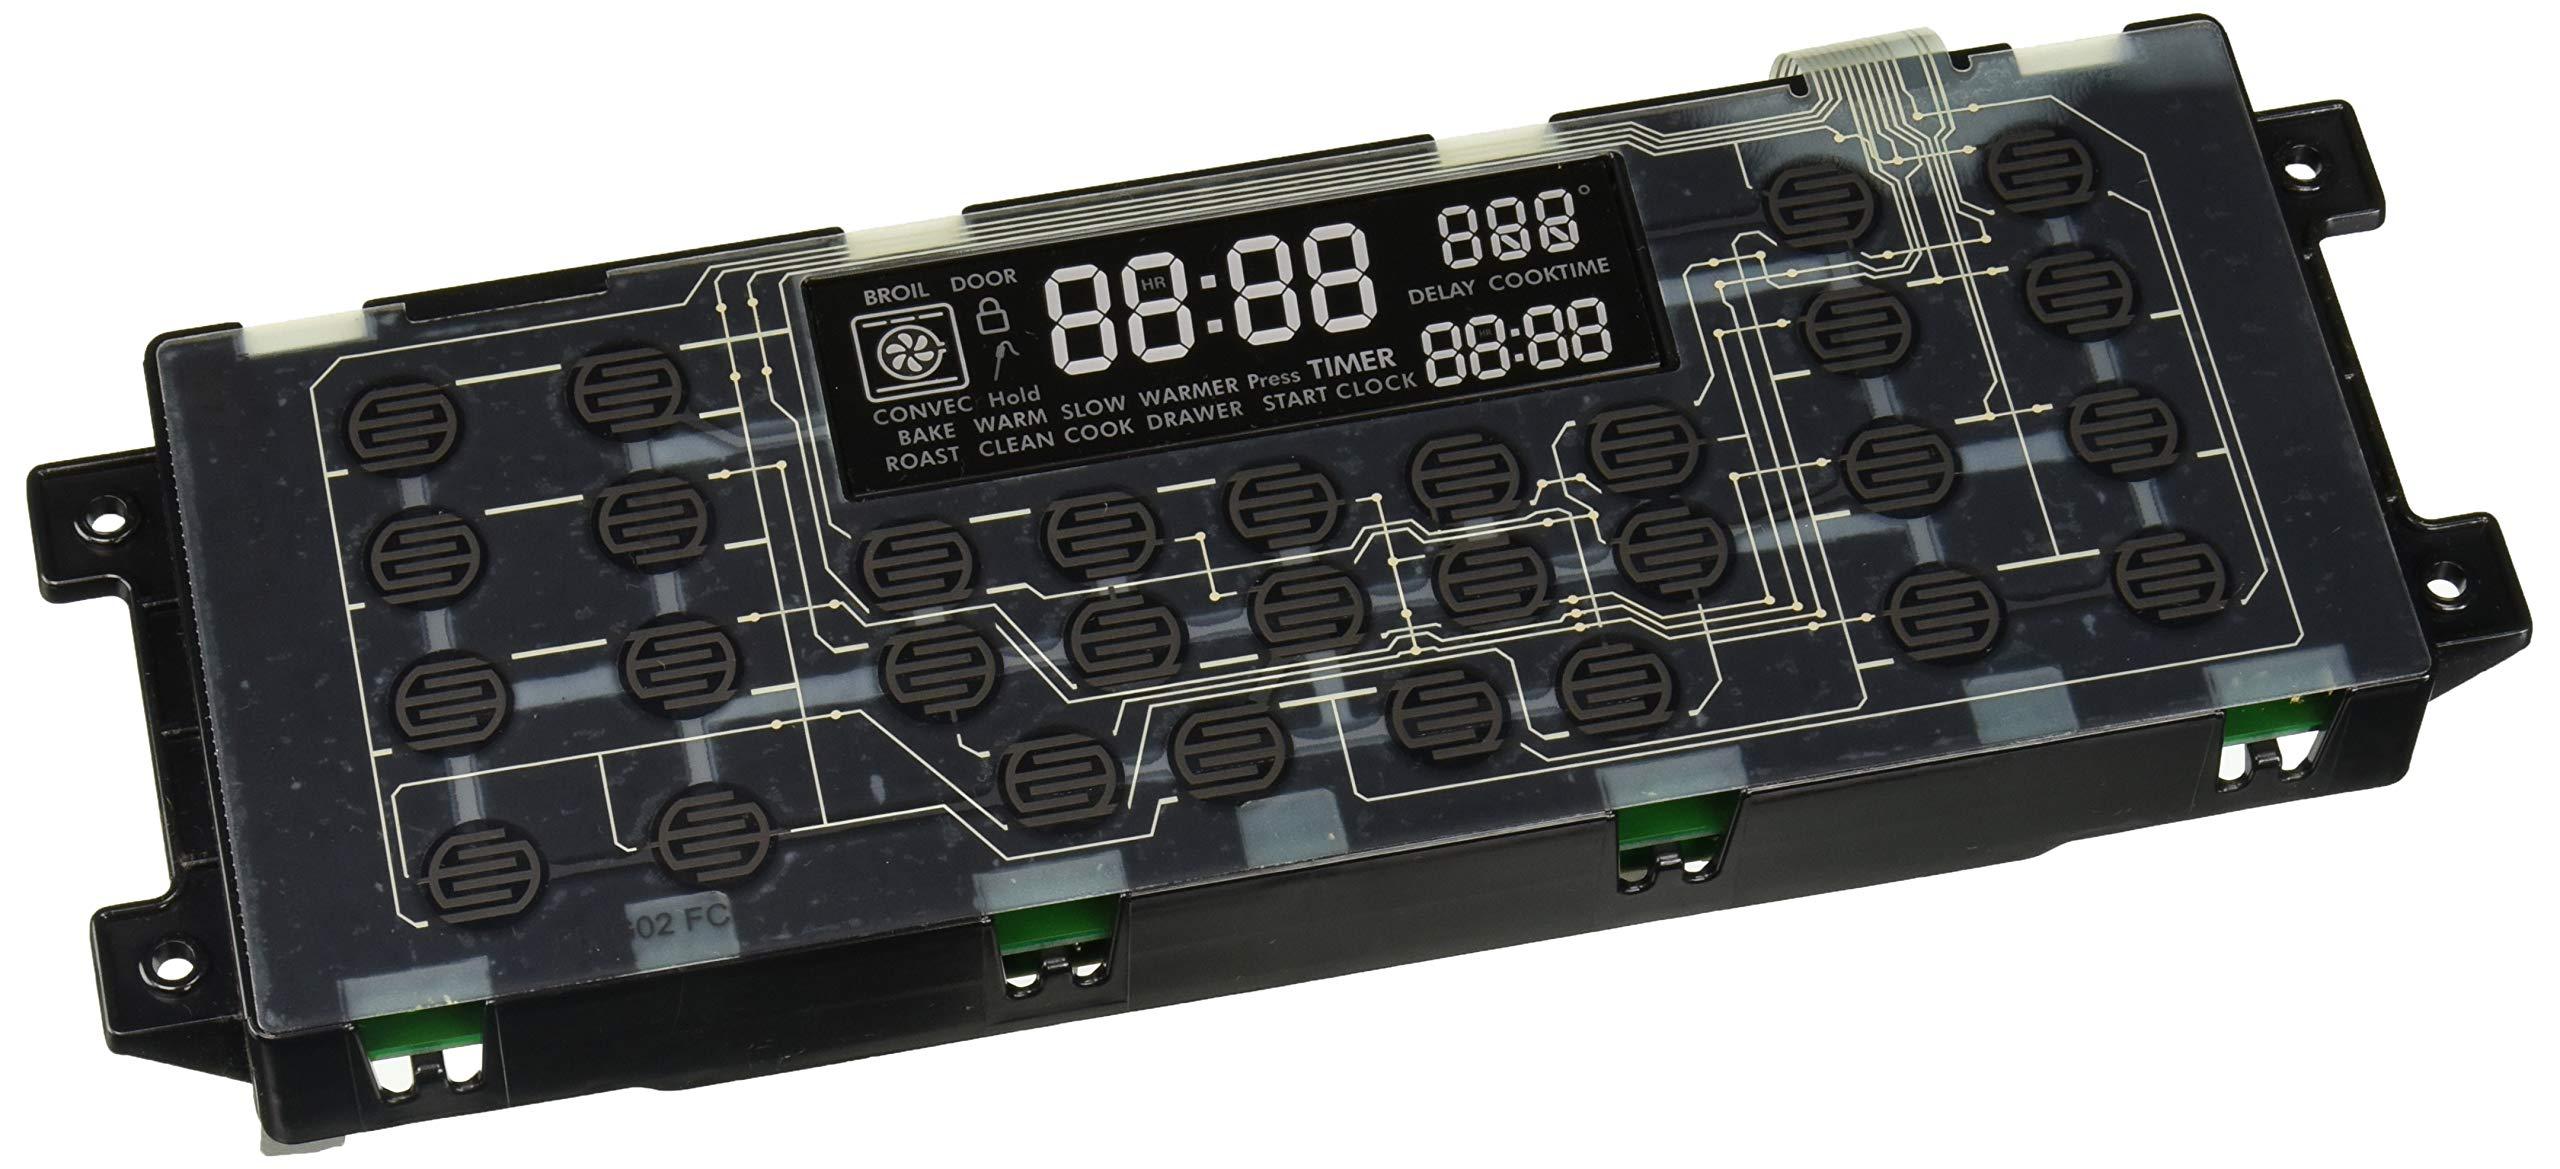 Frigidaire 316650010 Range Oven Control Board Original Equipment (OEM) Part White, Black by Frigidaire (Image #1)